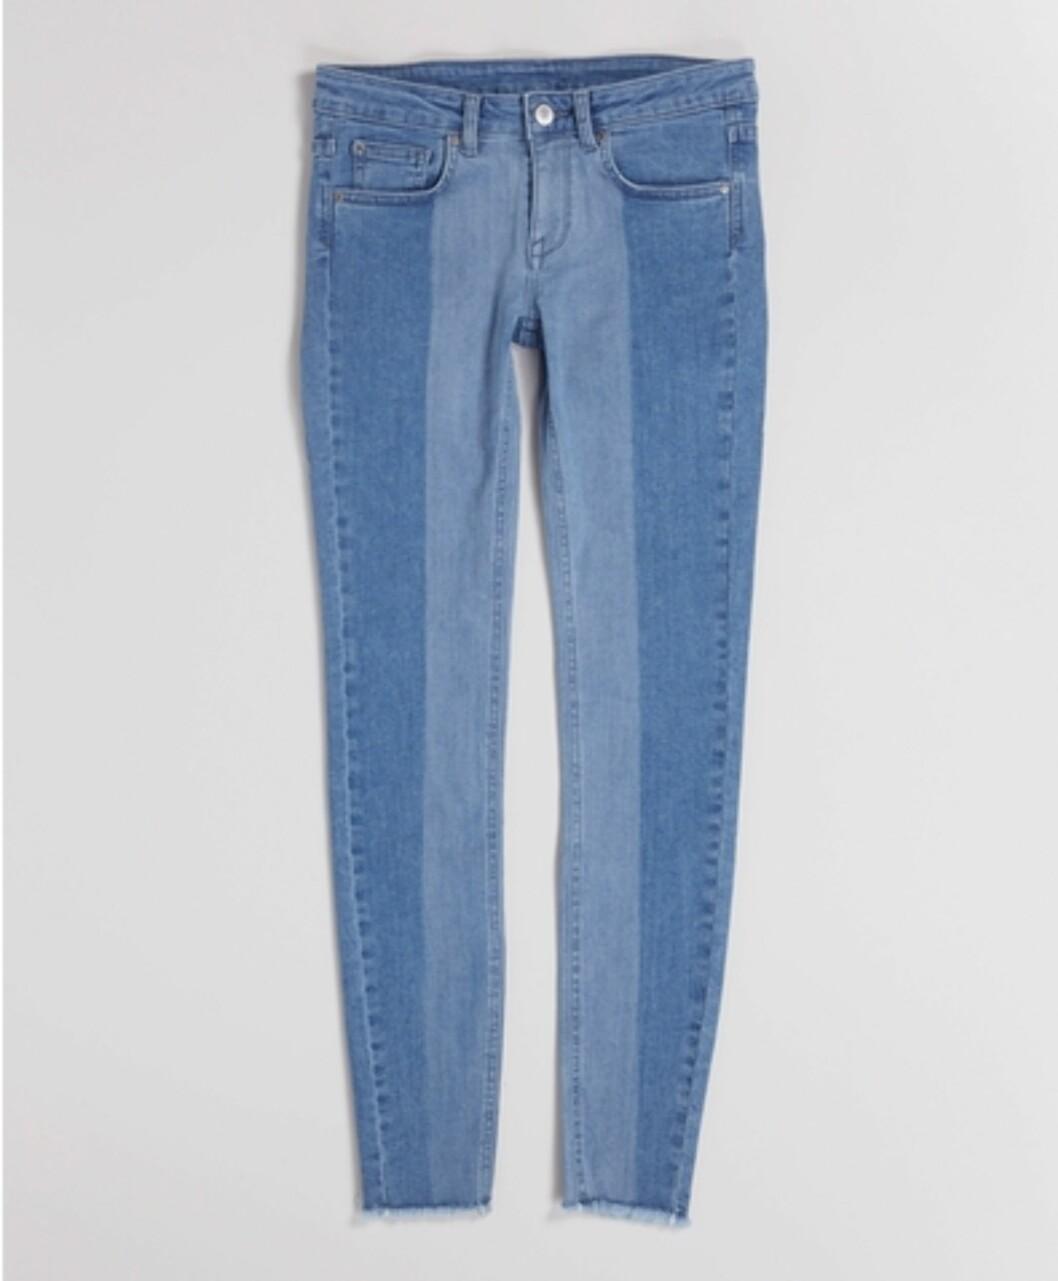 <strong>Jeans fra Gina Tricot |kr 399 | http:</strong>//apprl.com/sv/p/4KjA/